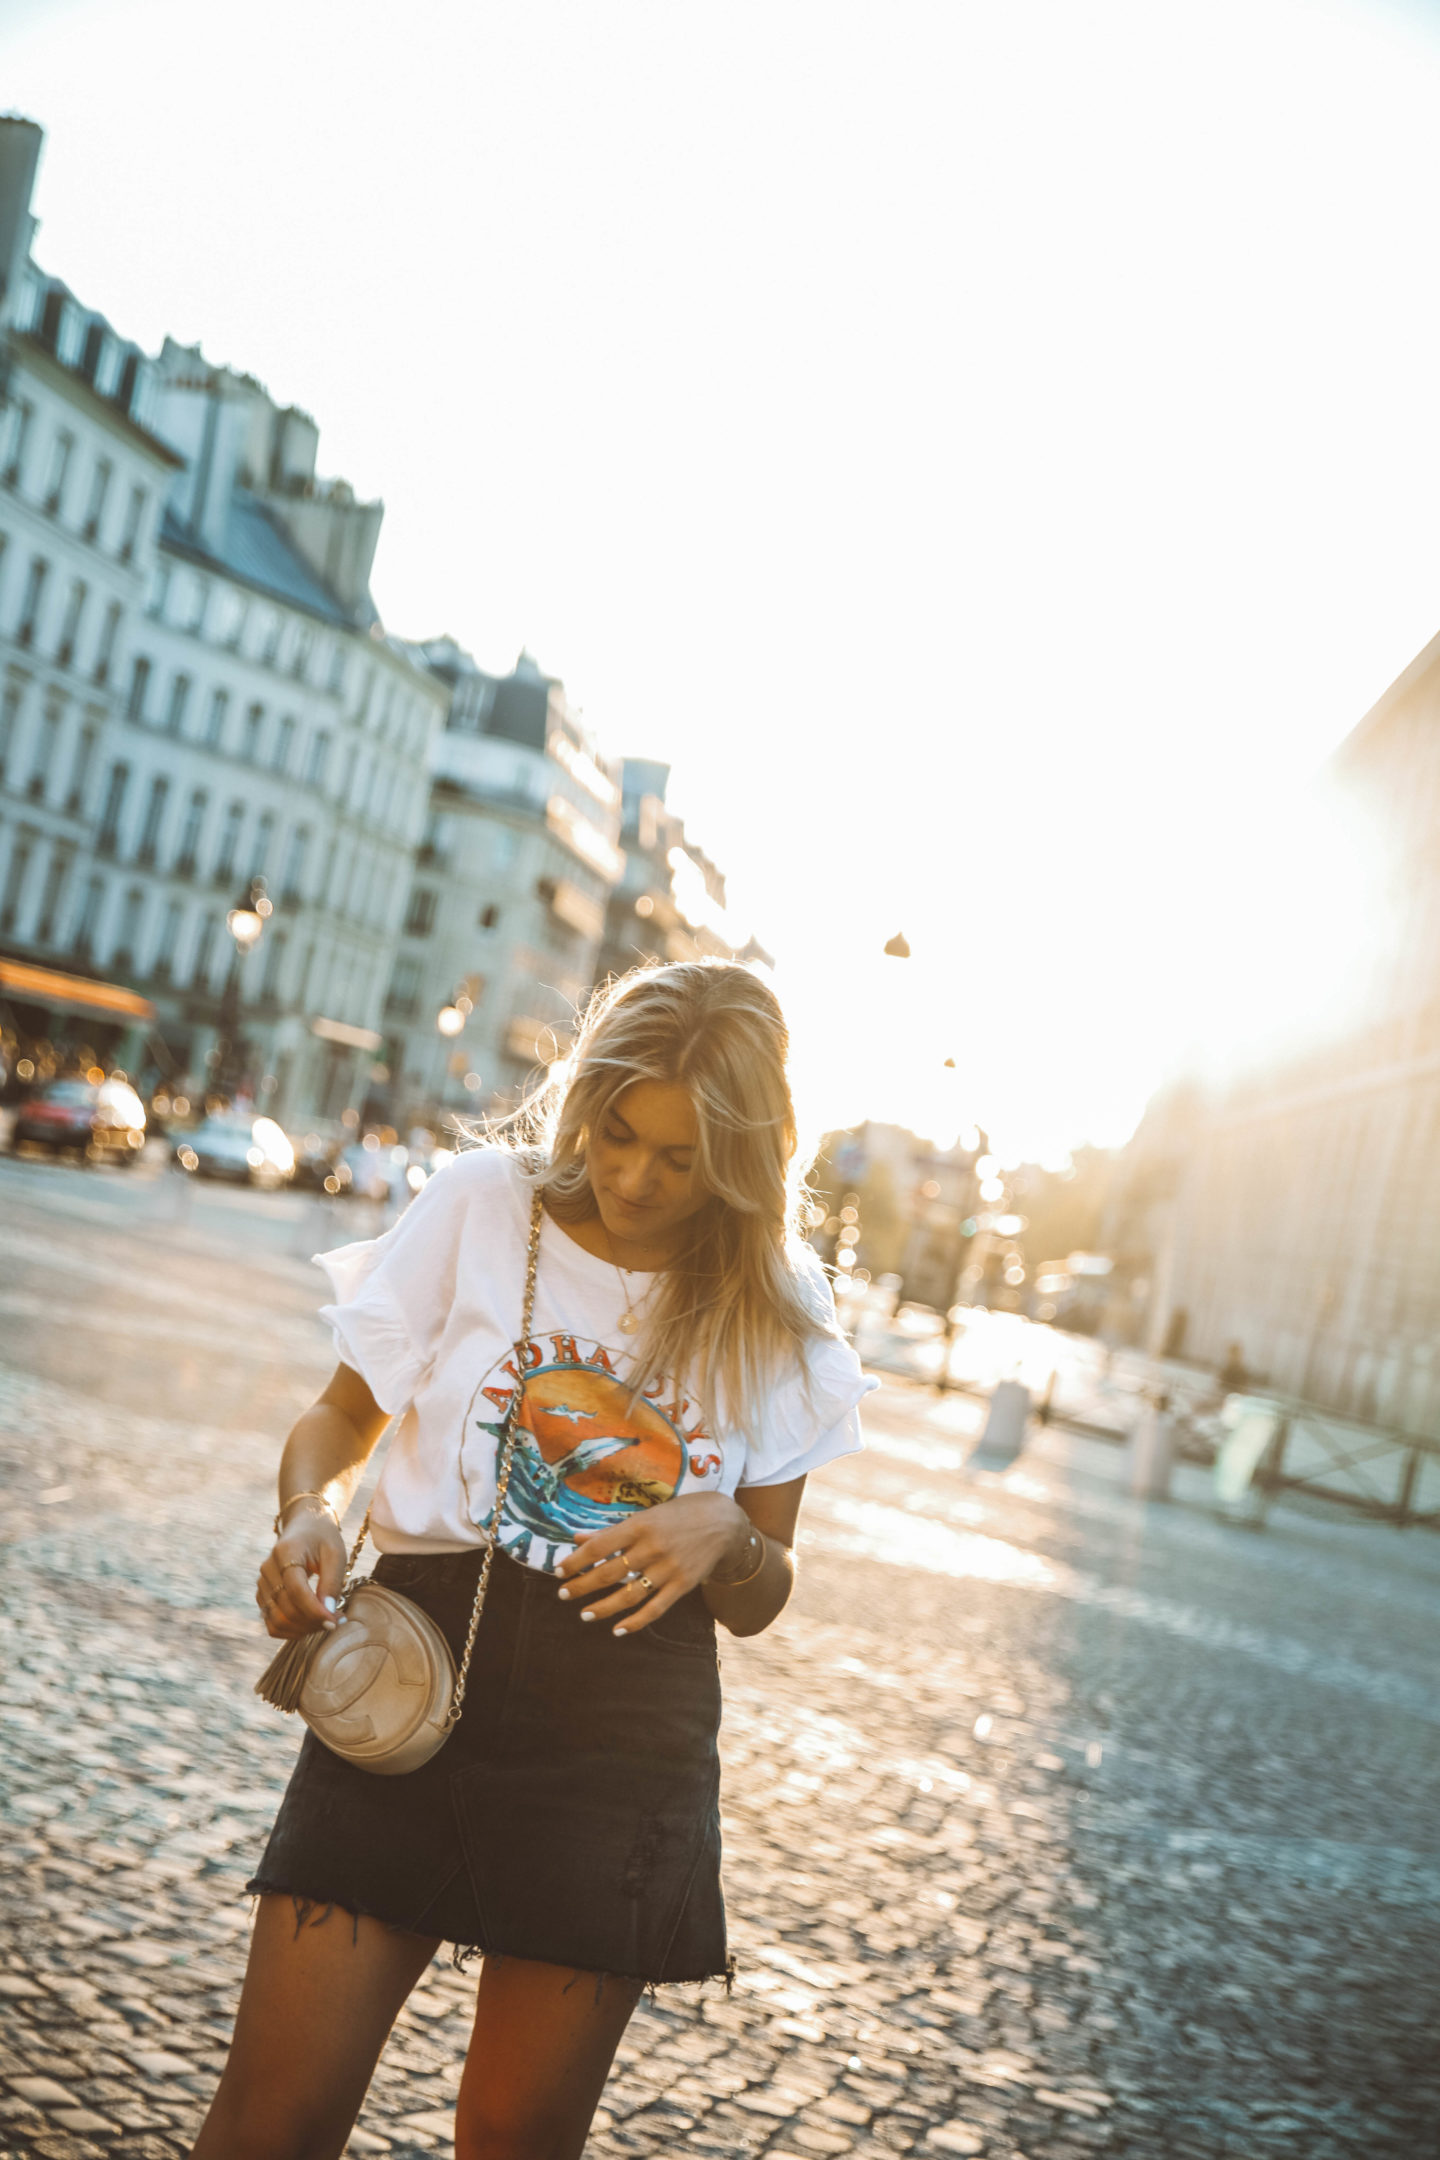 Sac Chanel vintage - Blondie Baby blog mode Paris et voyages